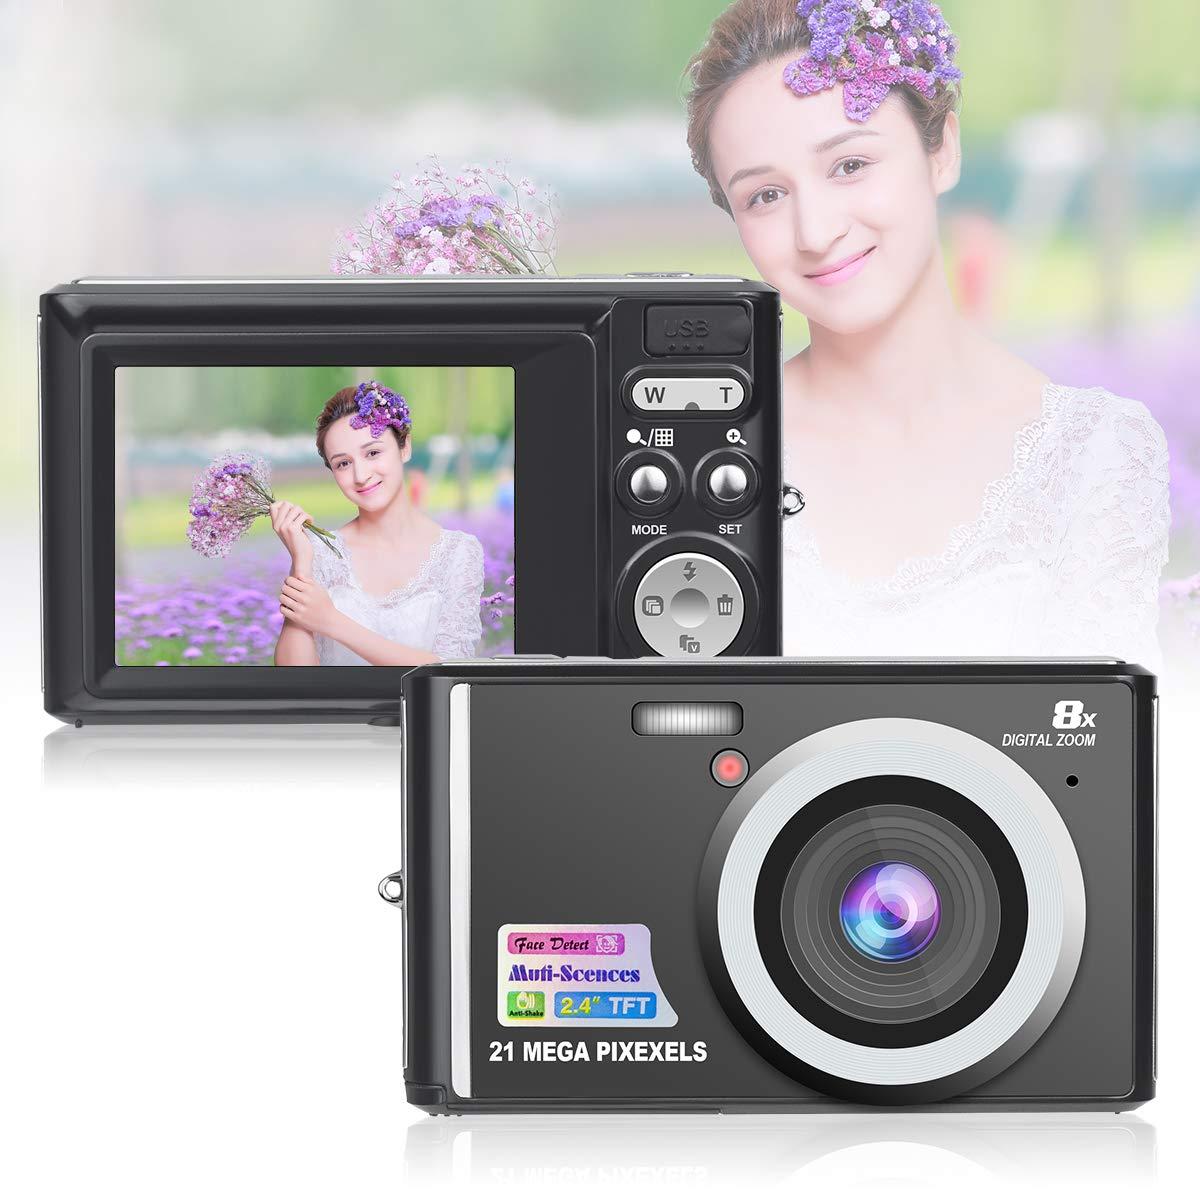 HD Mini Digital Cameras,21MP Point and Shoot Digital Video Cameras-Travel,Camping,Gifts (Black 1) by Suntak